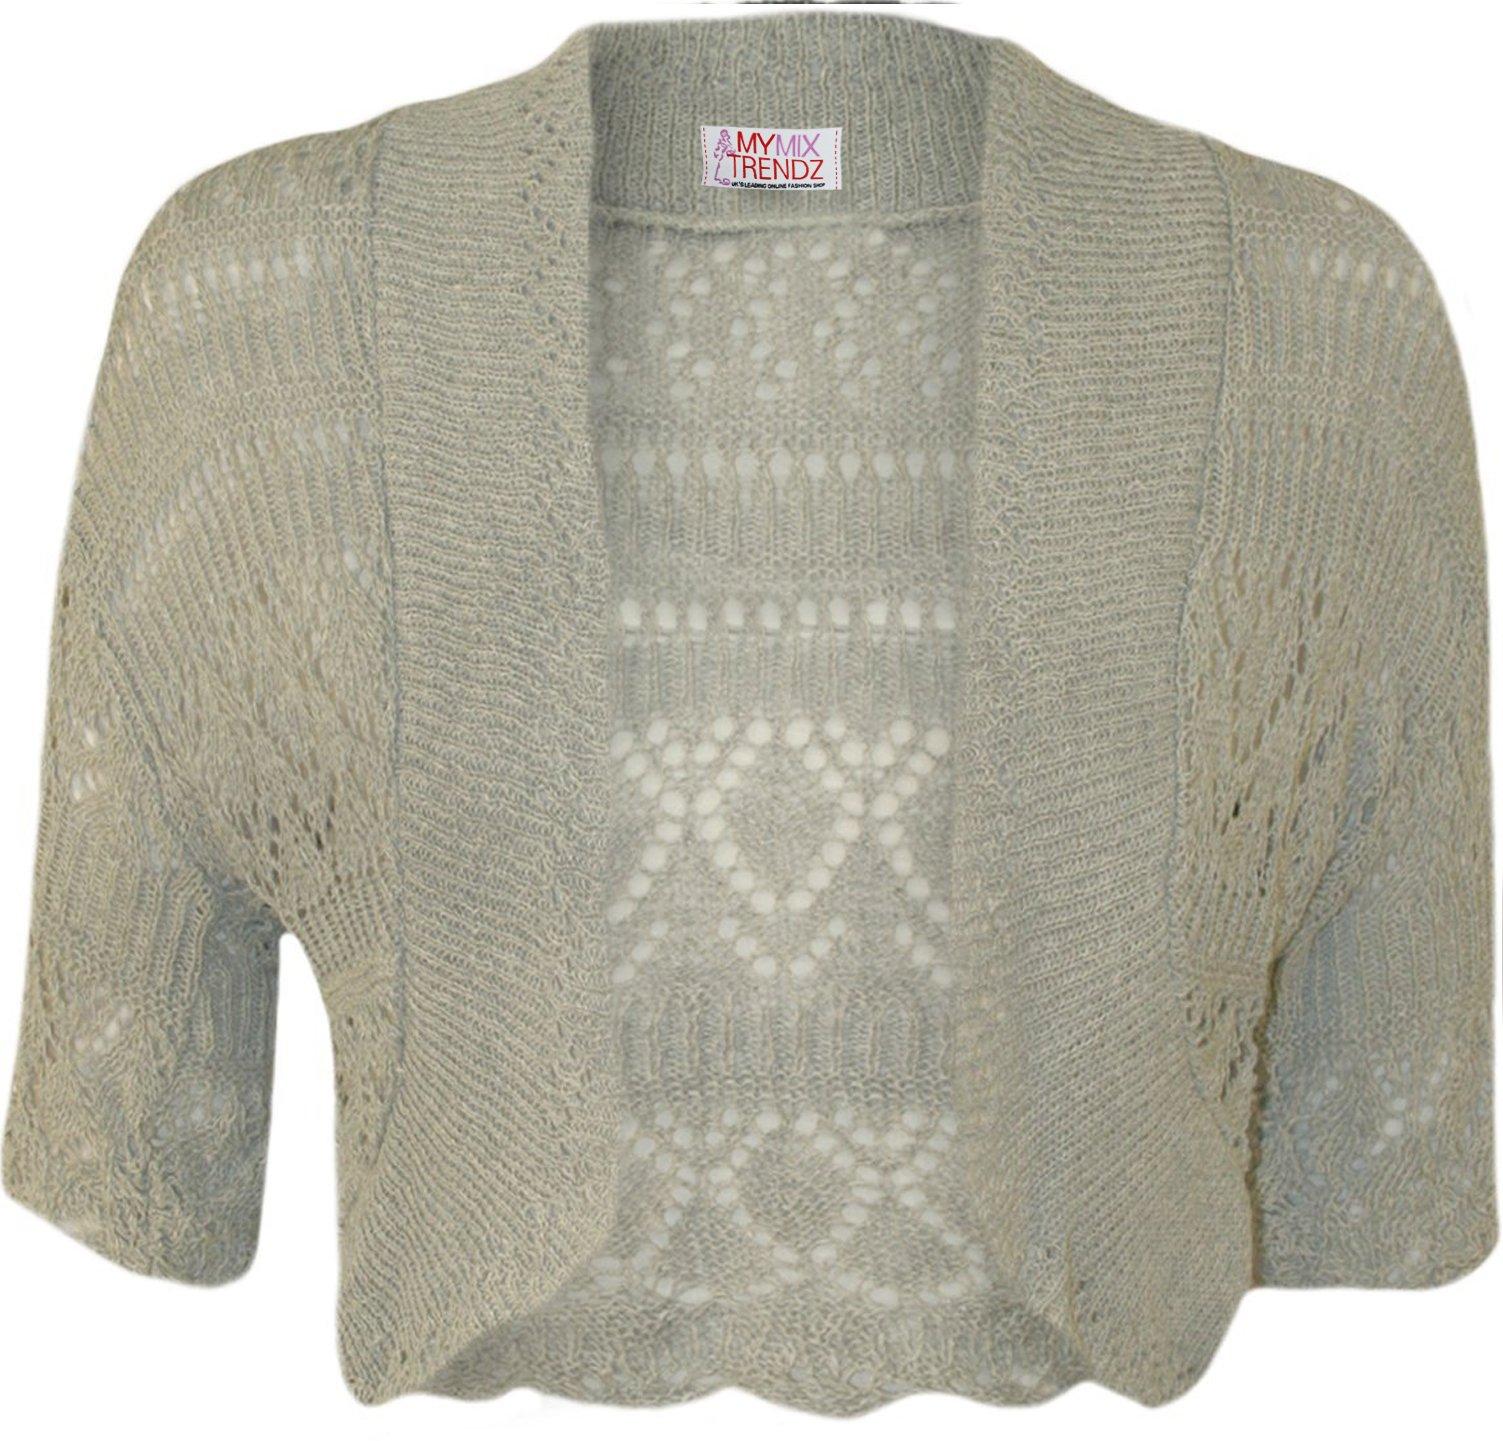 MyMixTrendz - Womens Crochet Knit Midi Sleeve Bolero Shrug (UK 12-16 (EU 40-44 US 8-12), Silver Grey)